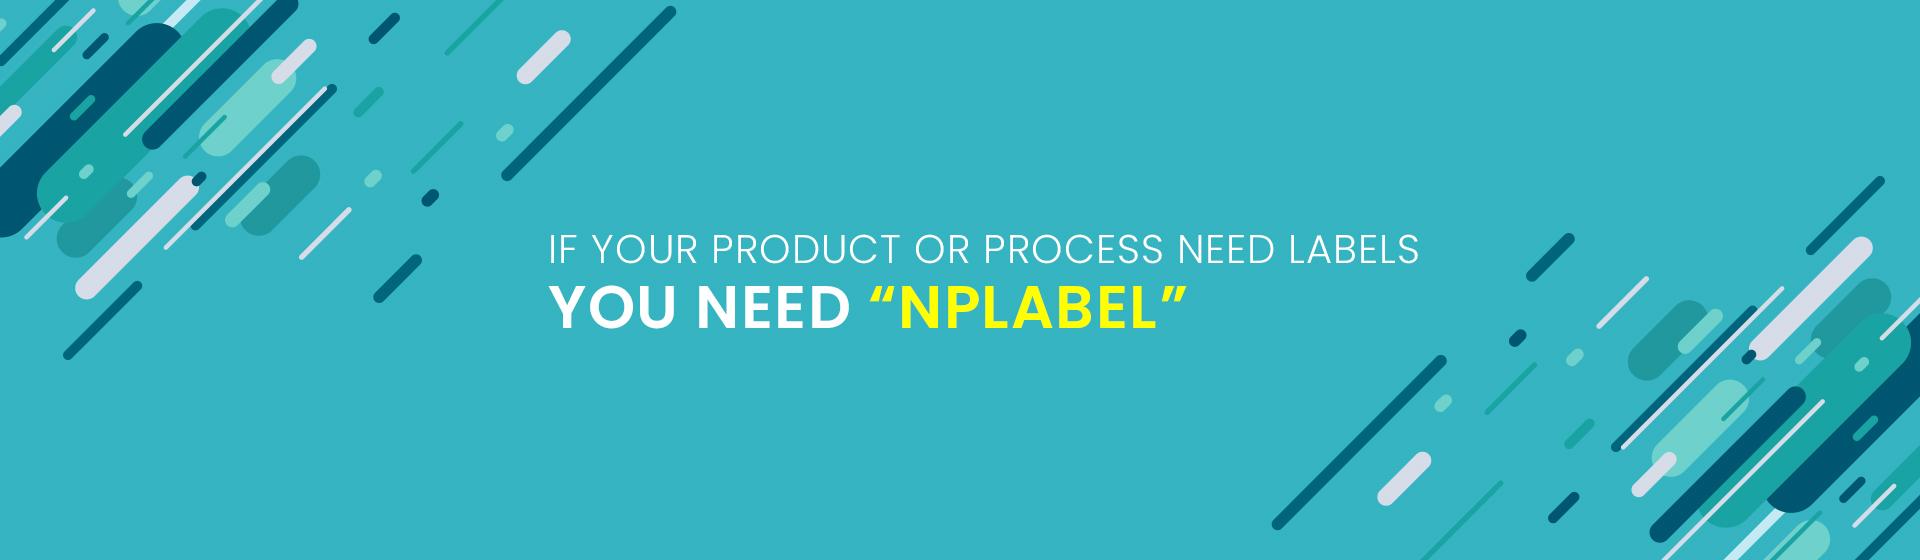 nplabel-1